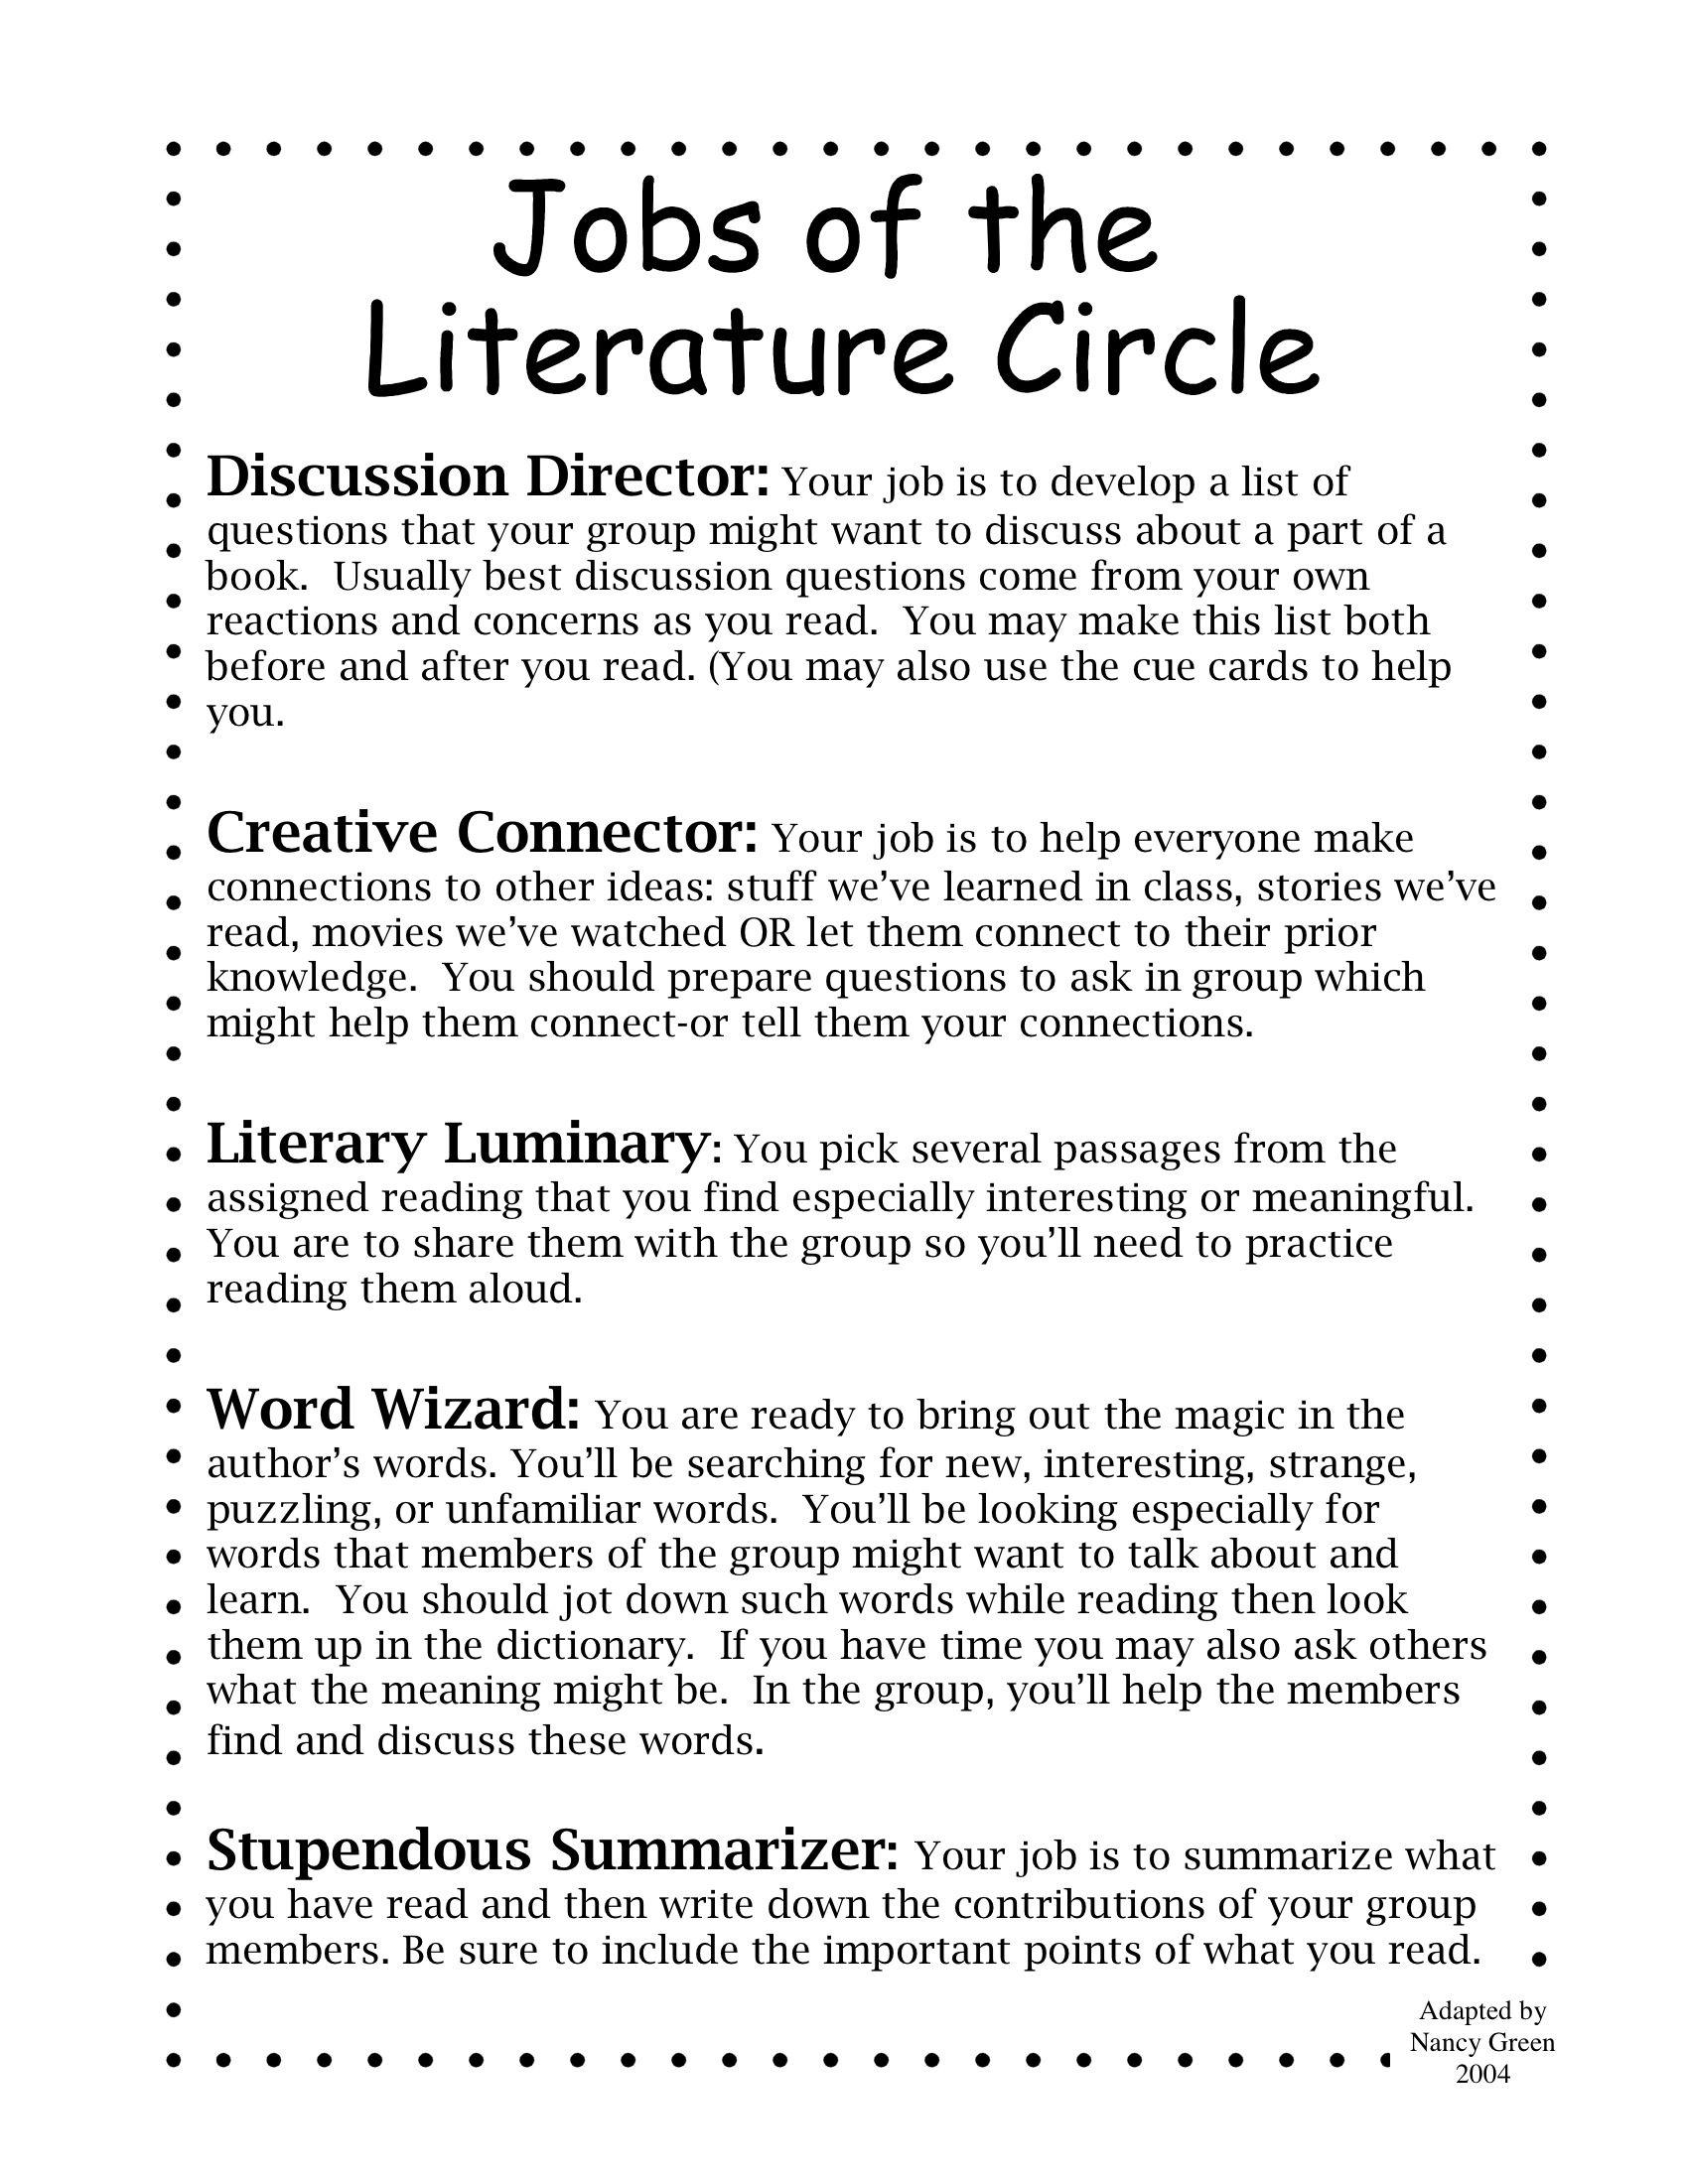 Literature Circle Jobs Stupendous Summarizer Is Better